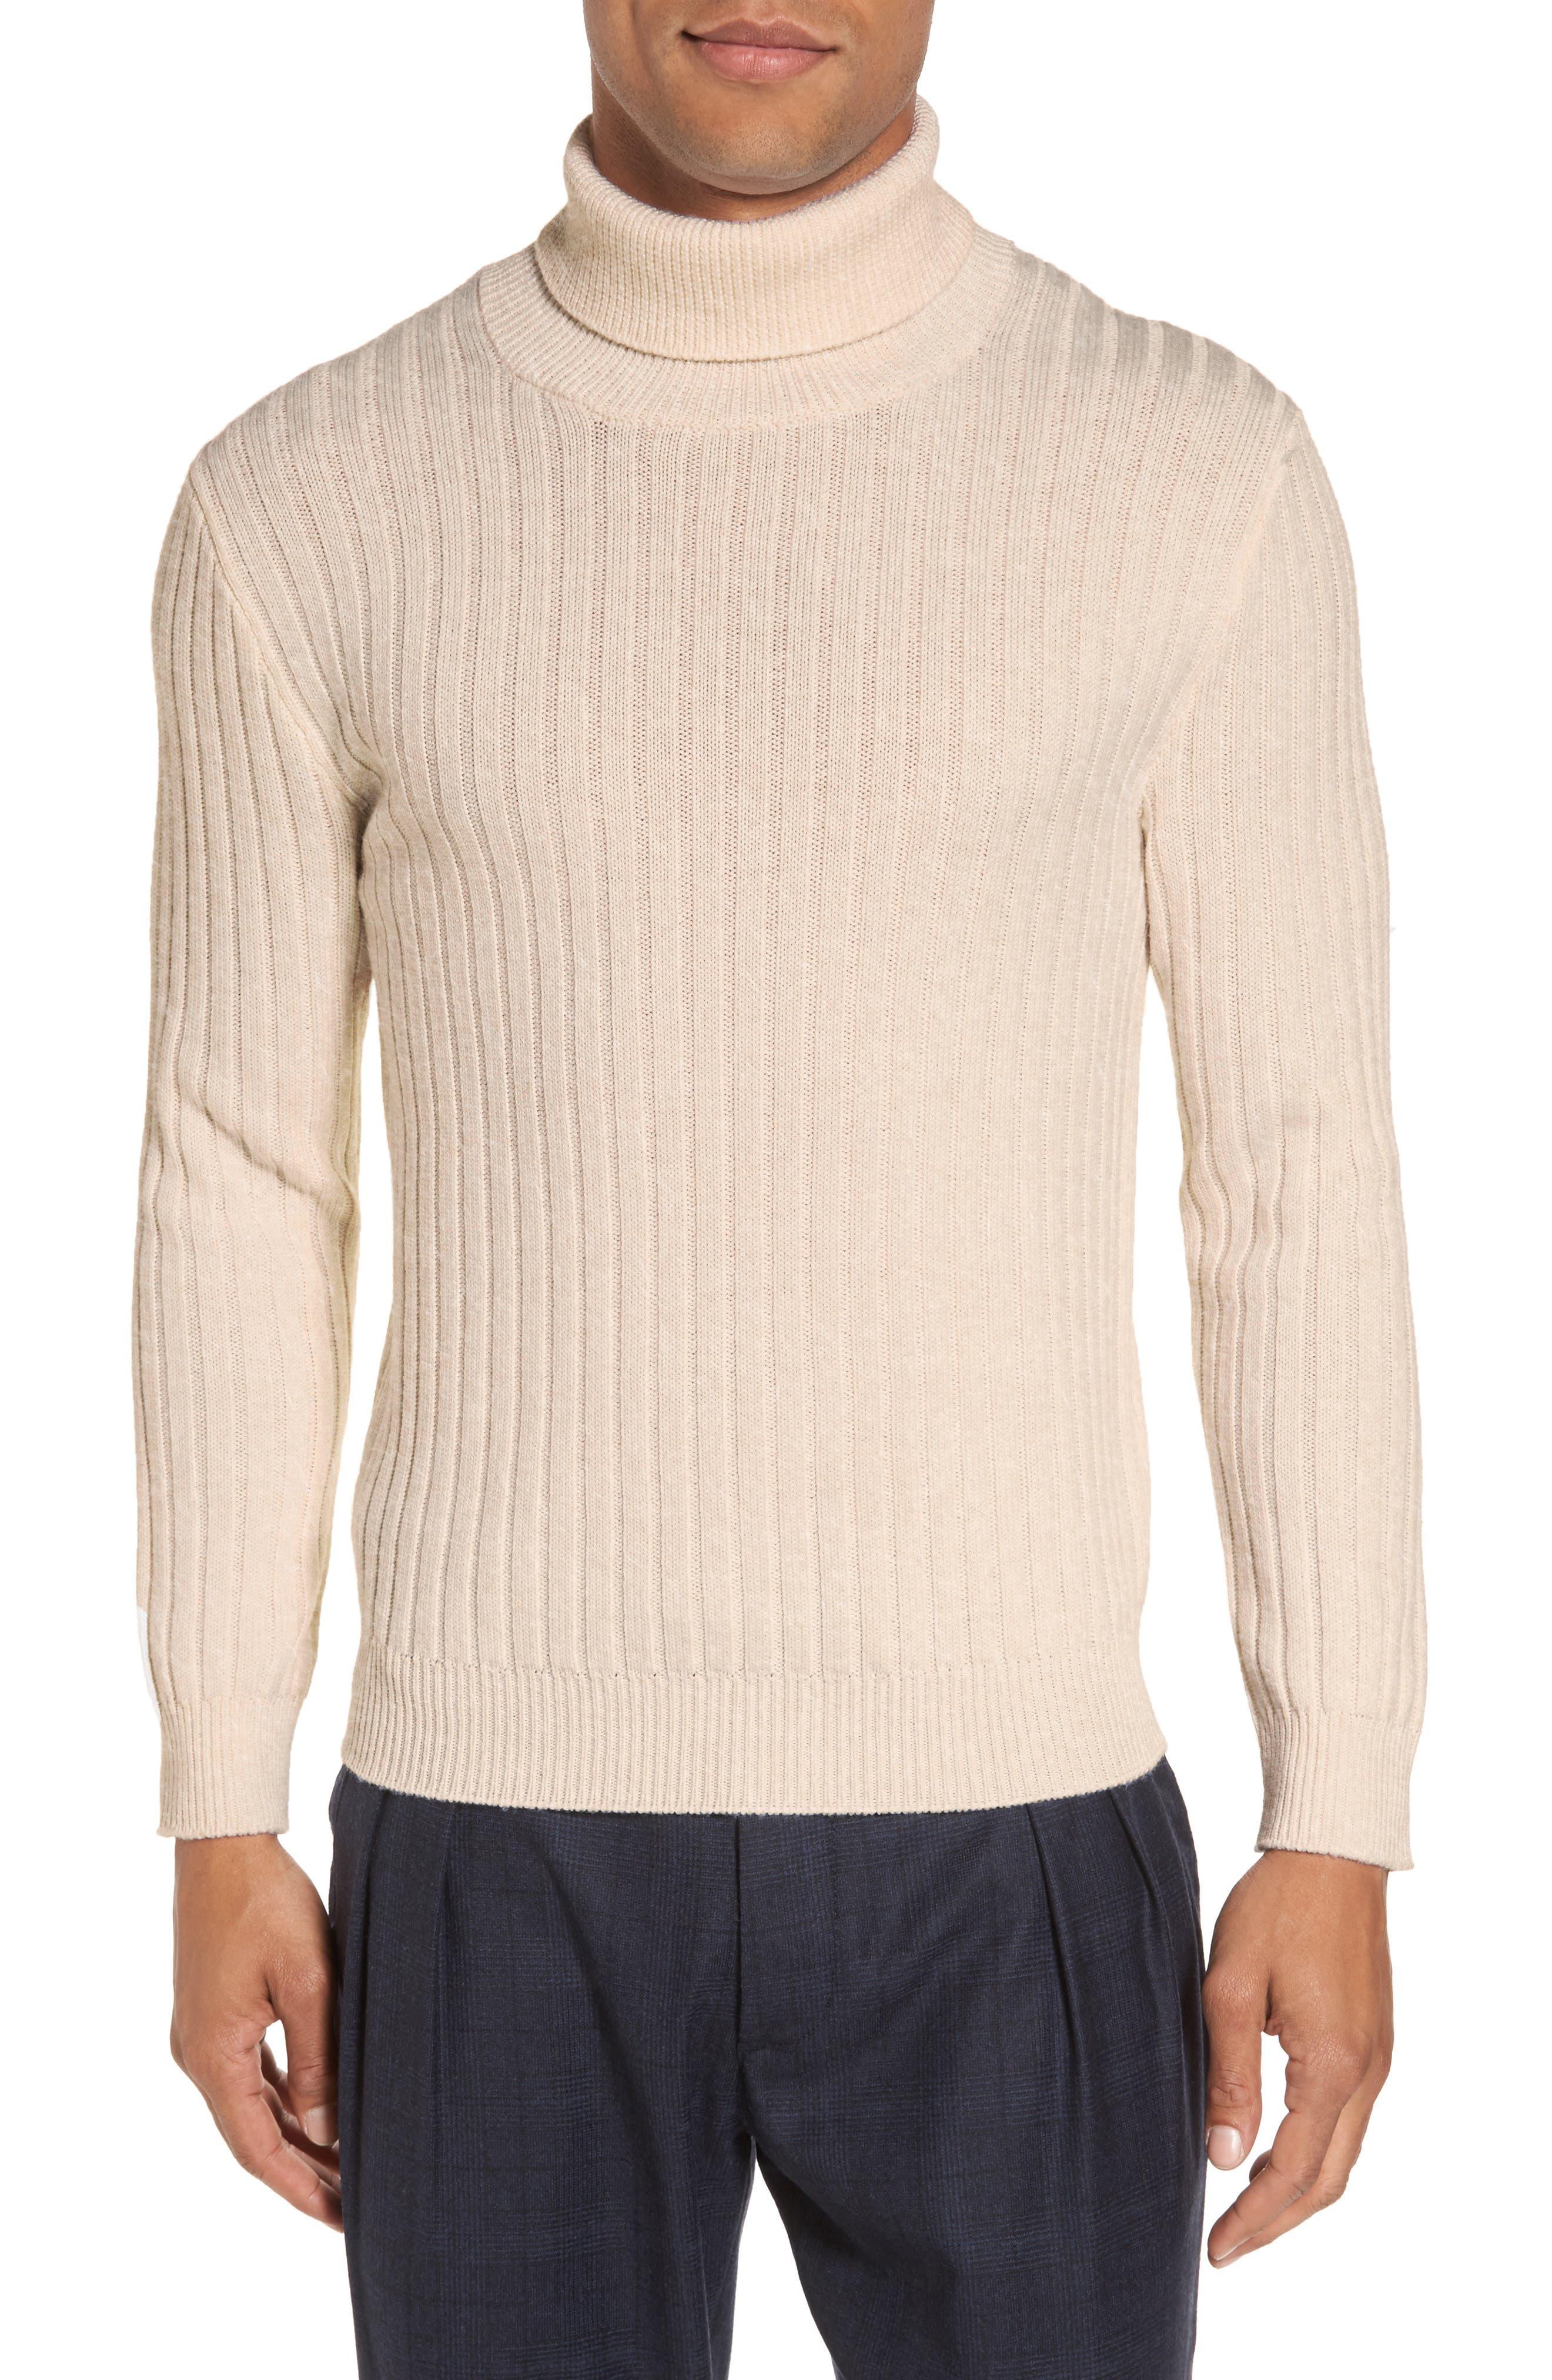 Alternate Image 1 Selected - Eleventy Ribbed Turtleneck Wool Sweater